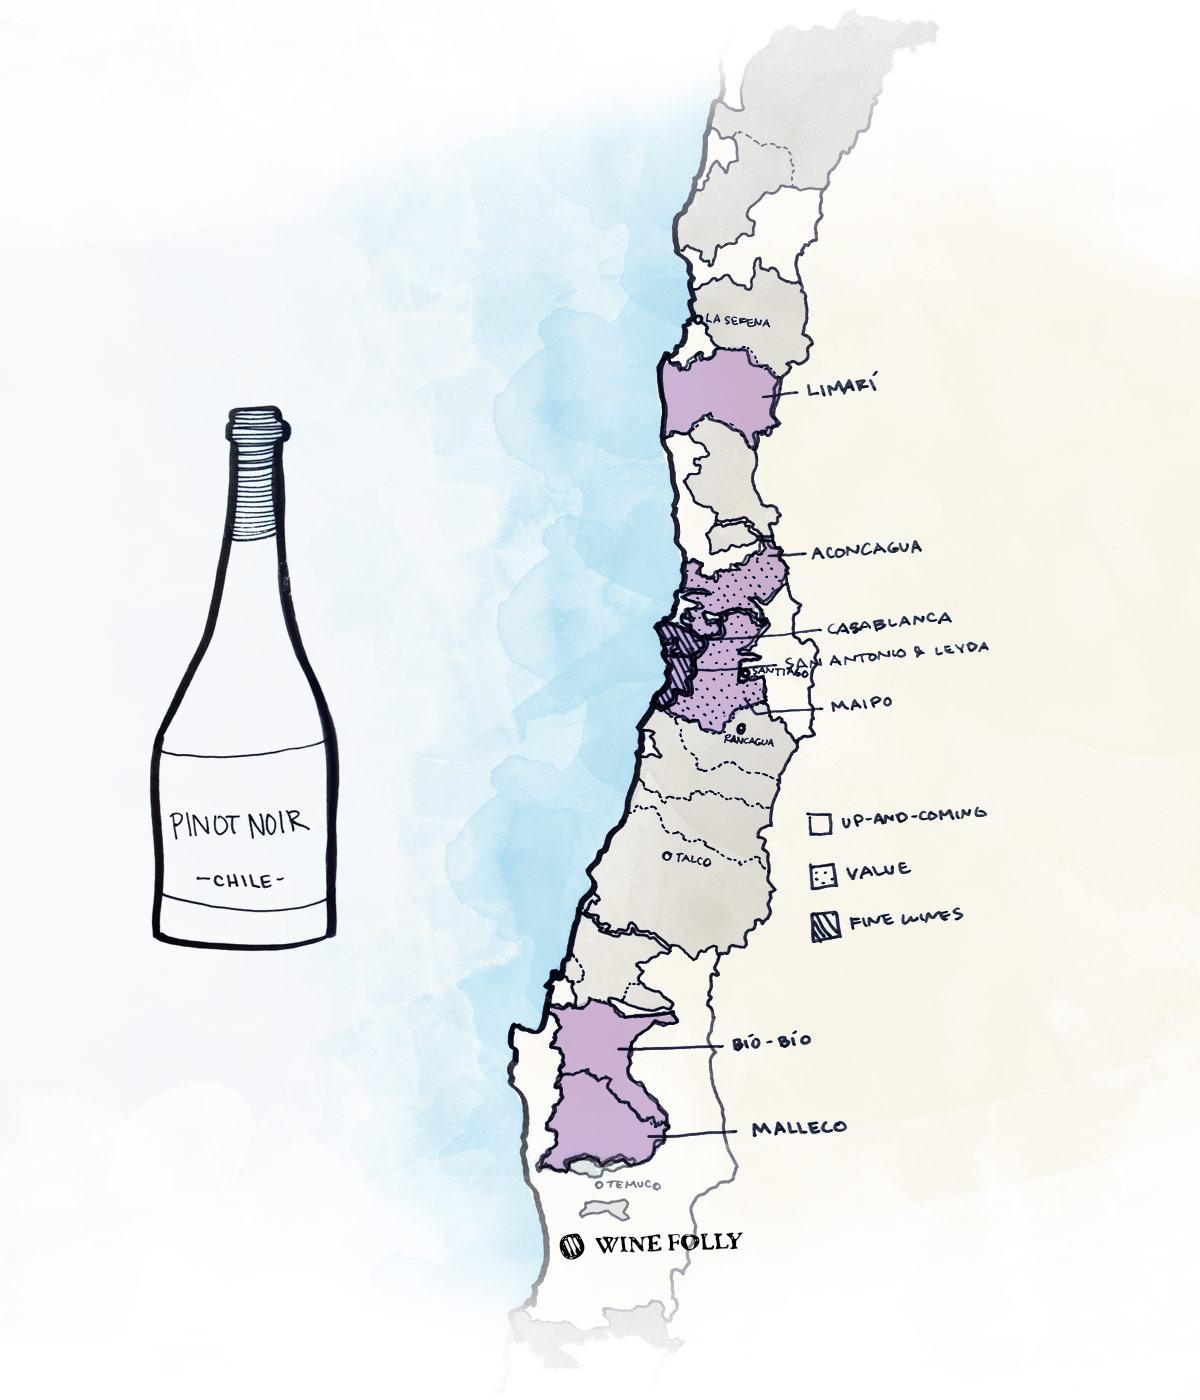 chilean-pinot-noir-best-wine-map.jpg